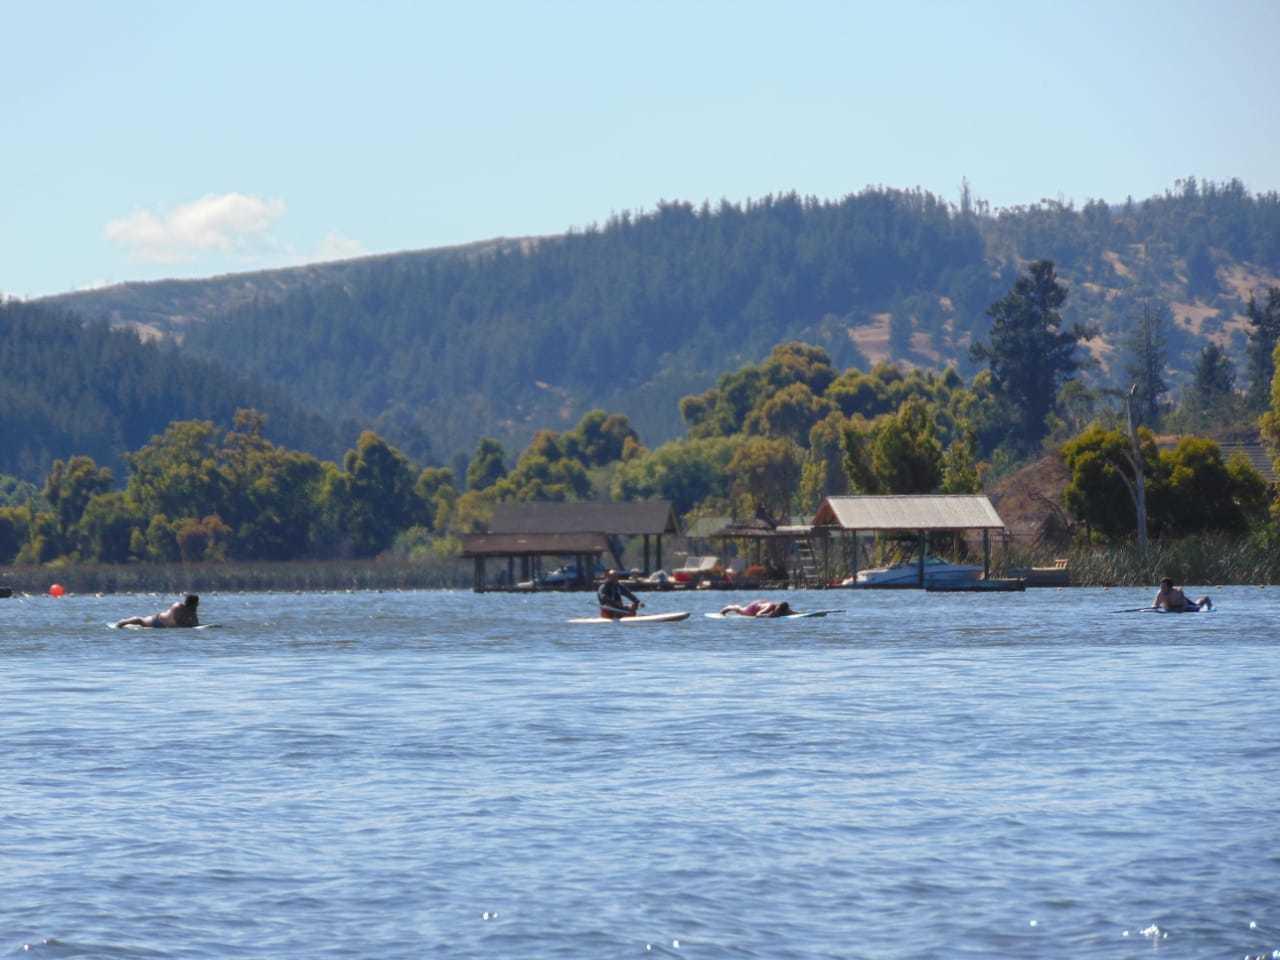 Arriendo de Stand-Up Paddle por hora en Vichuquén